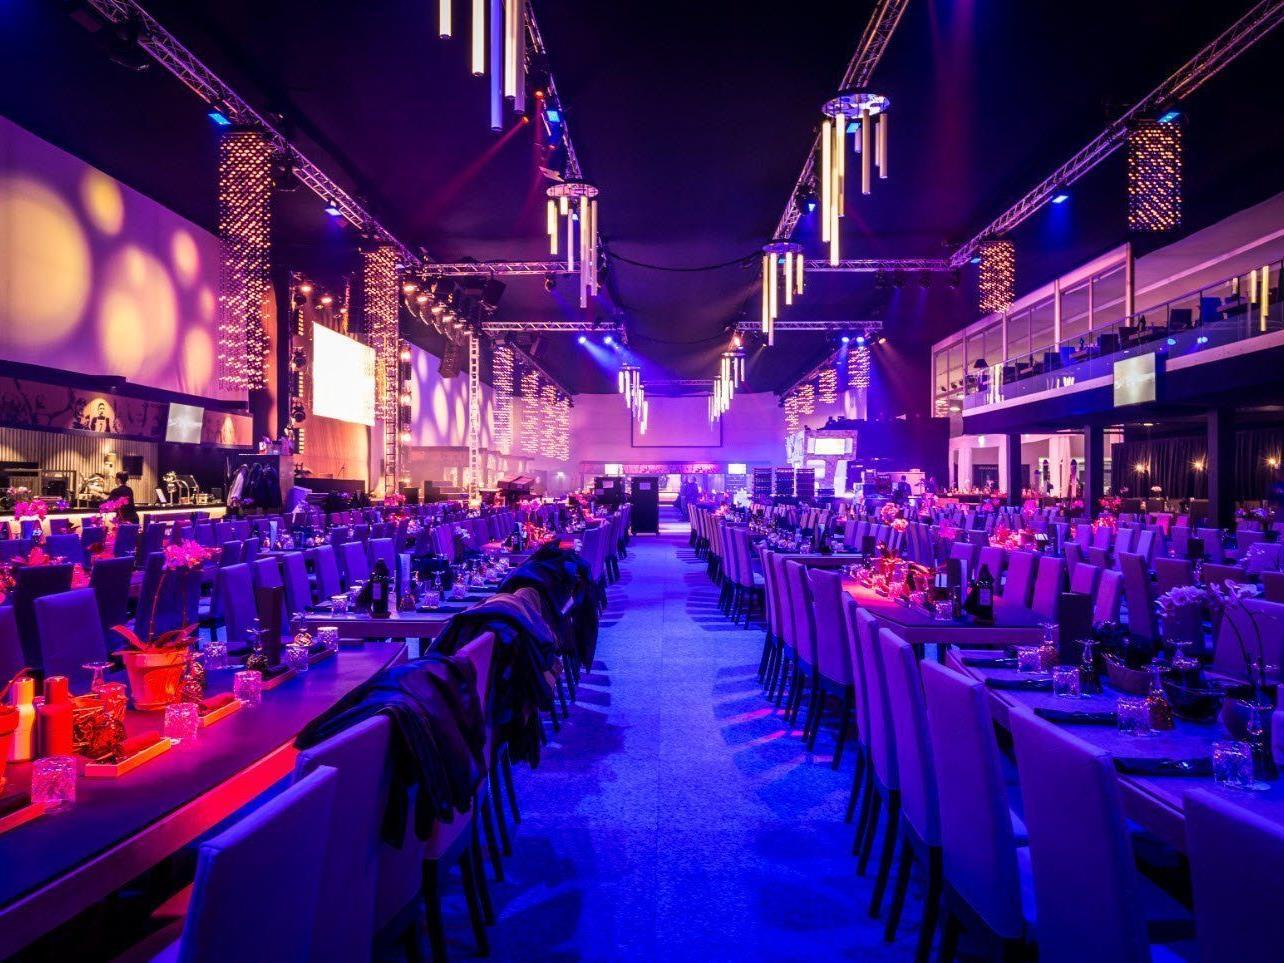 Zumtobel setzt mit innovativen Beleuchtungslösungen den KitzRaceClub in Szene